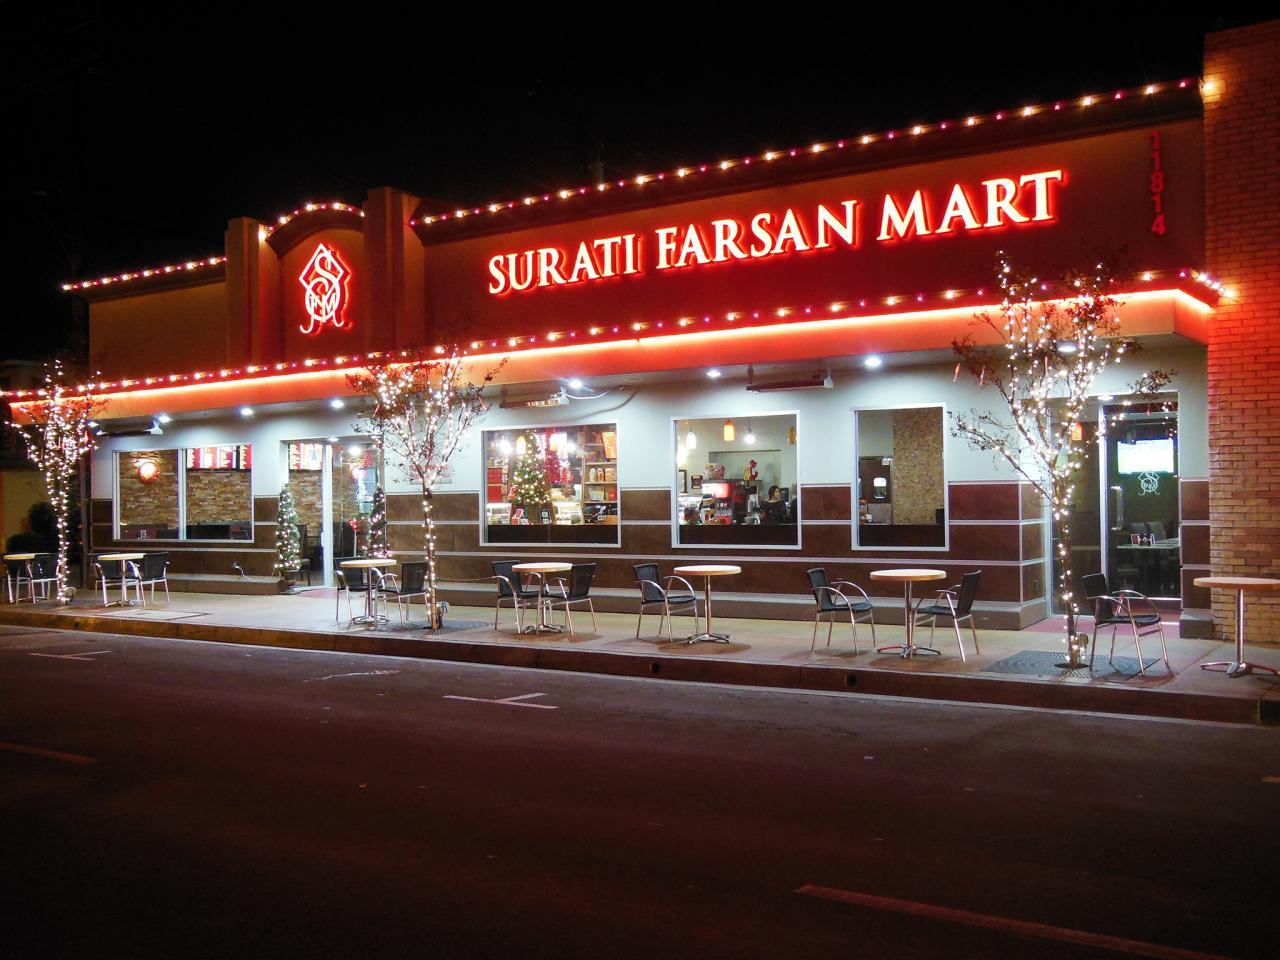 Surati Farsan Mart Exterior Restaurant Los Angeles California